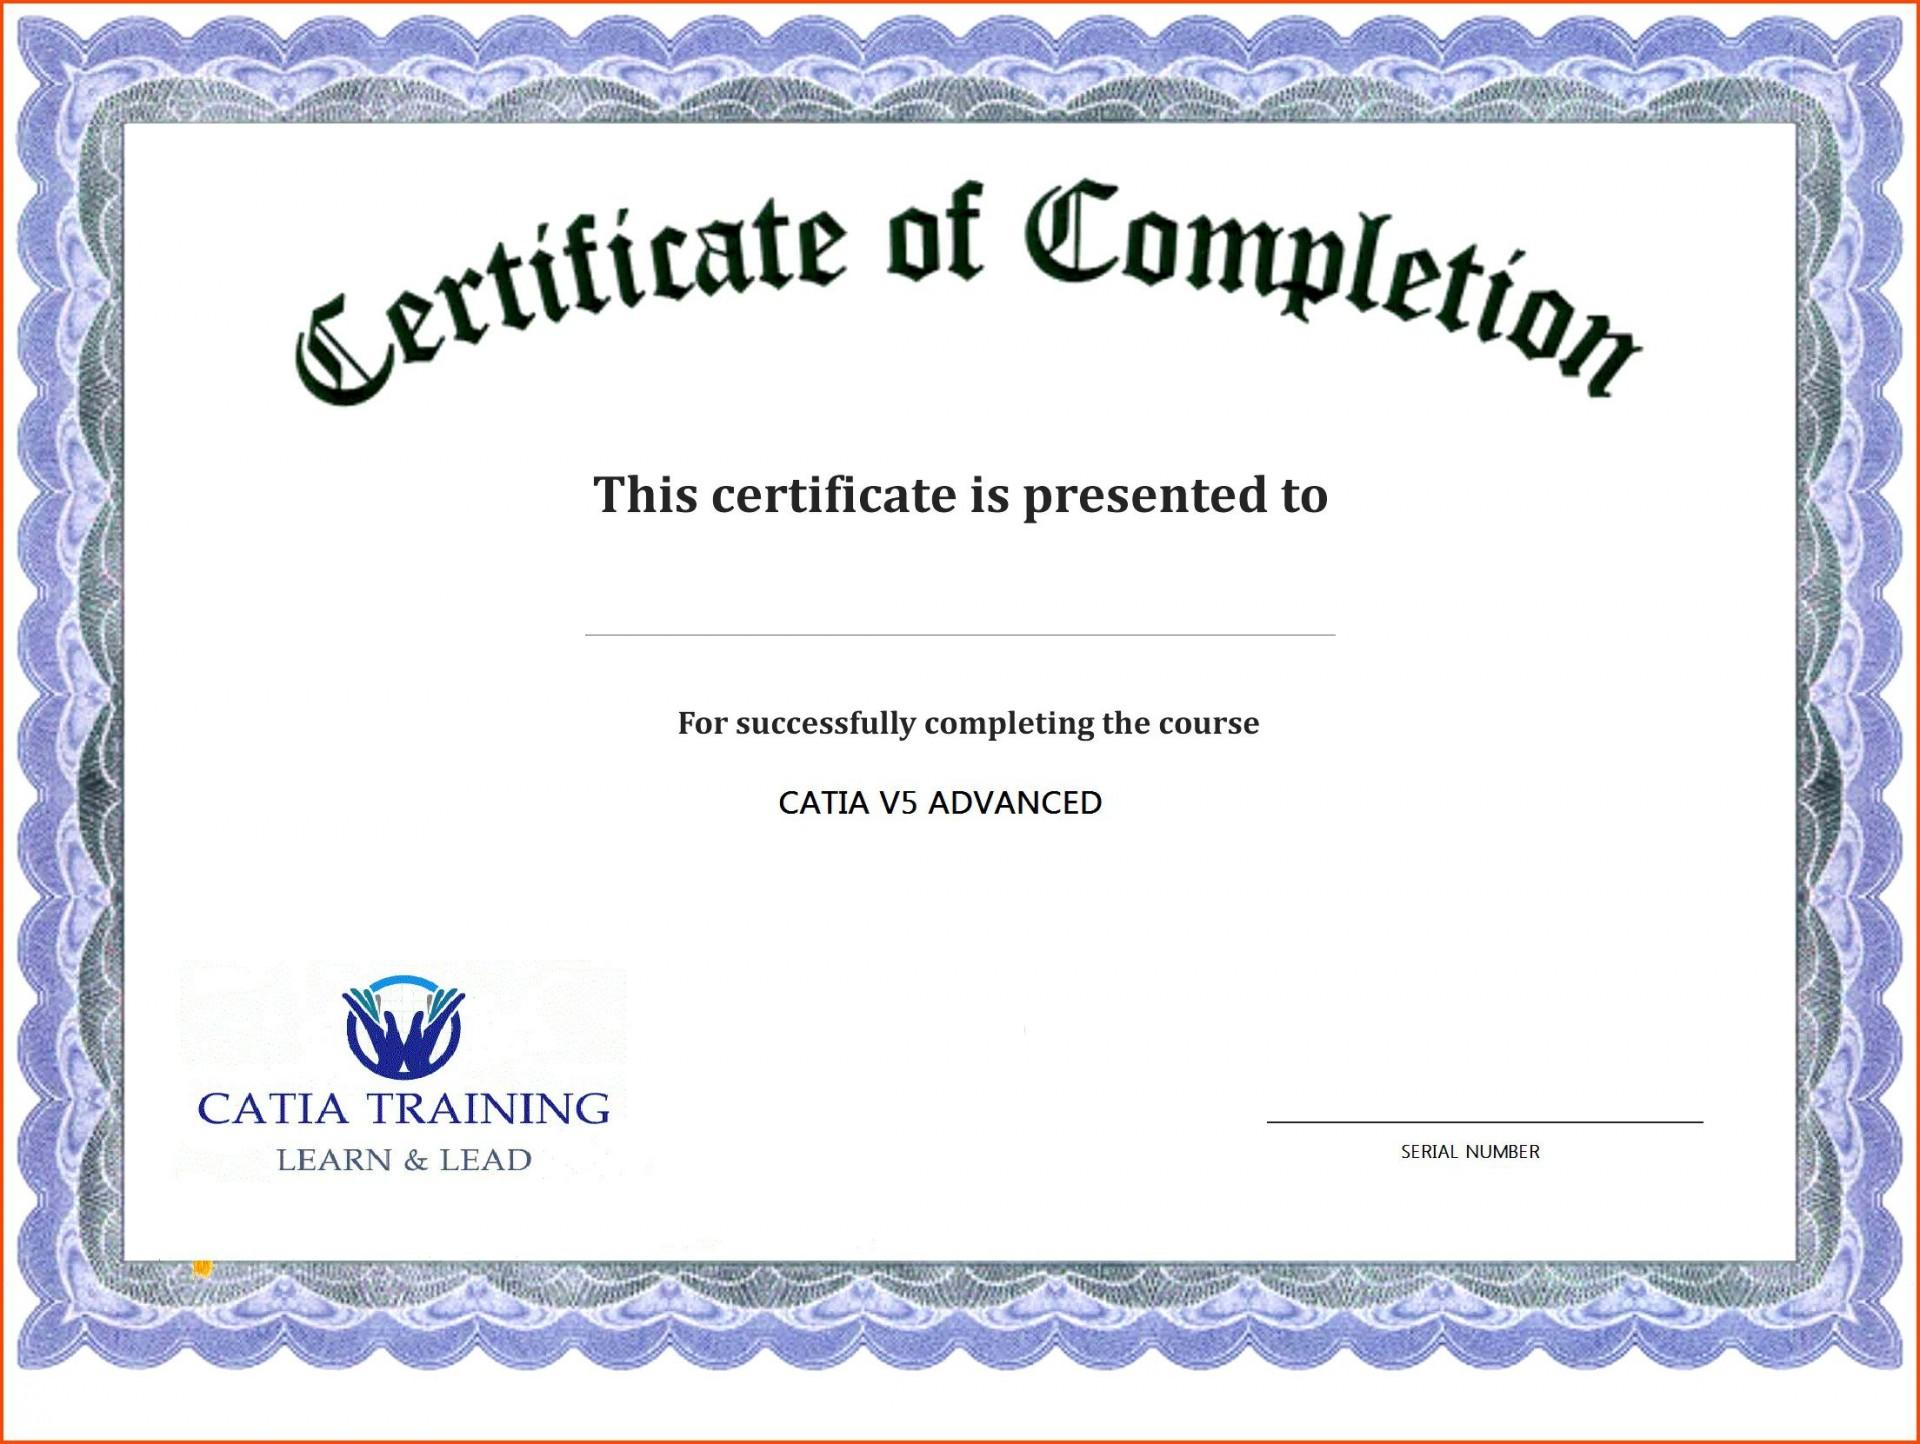 003 Incredible Certificate Template For Word Design  Award 2007 M1920